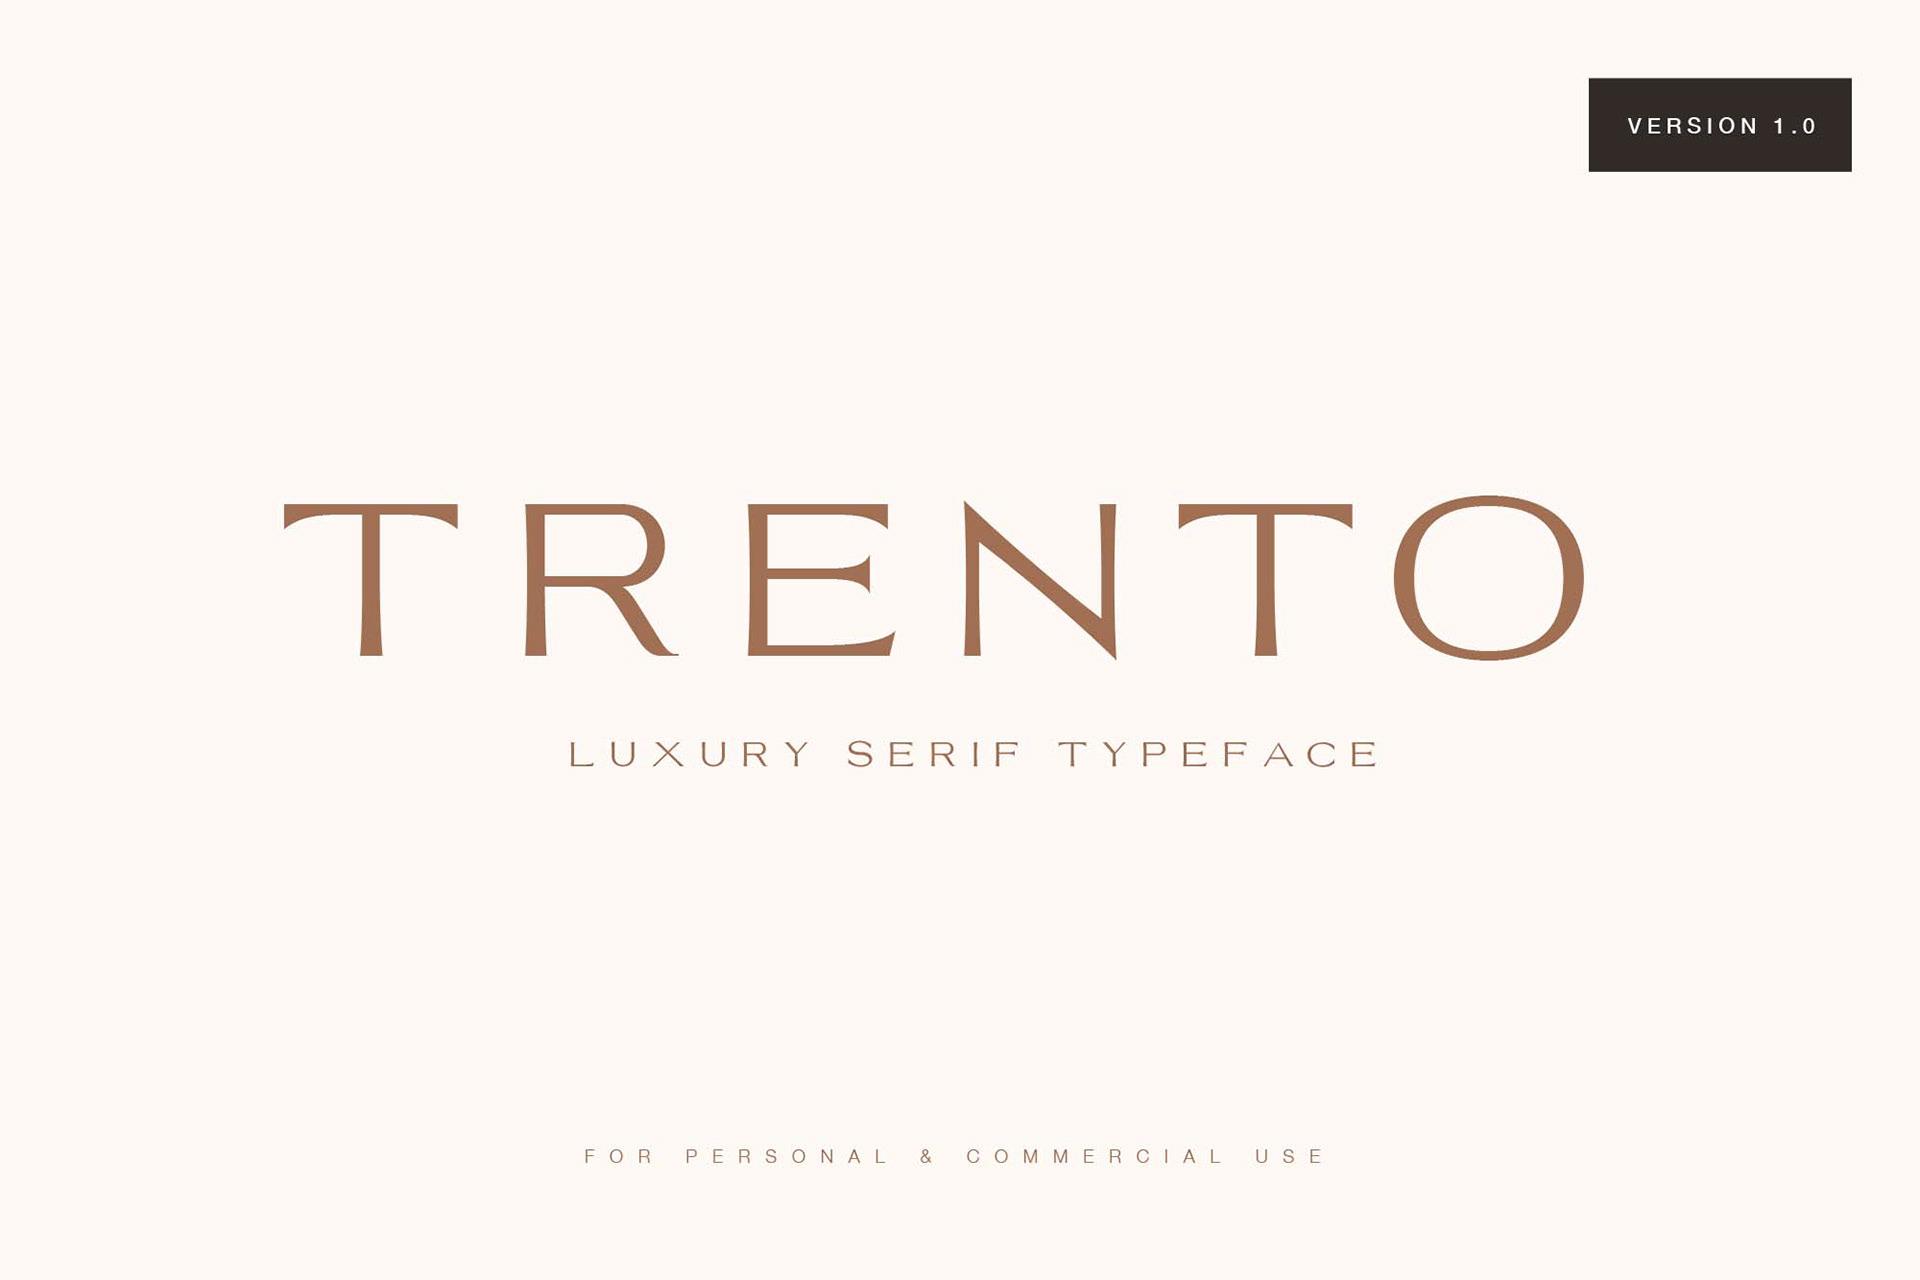 Trento Free Font - serif